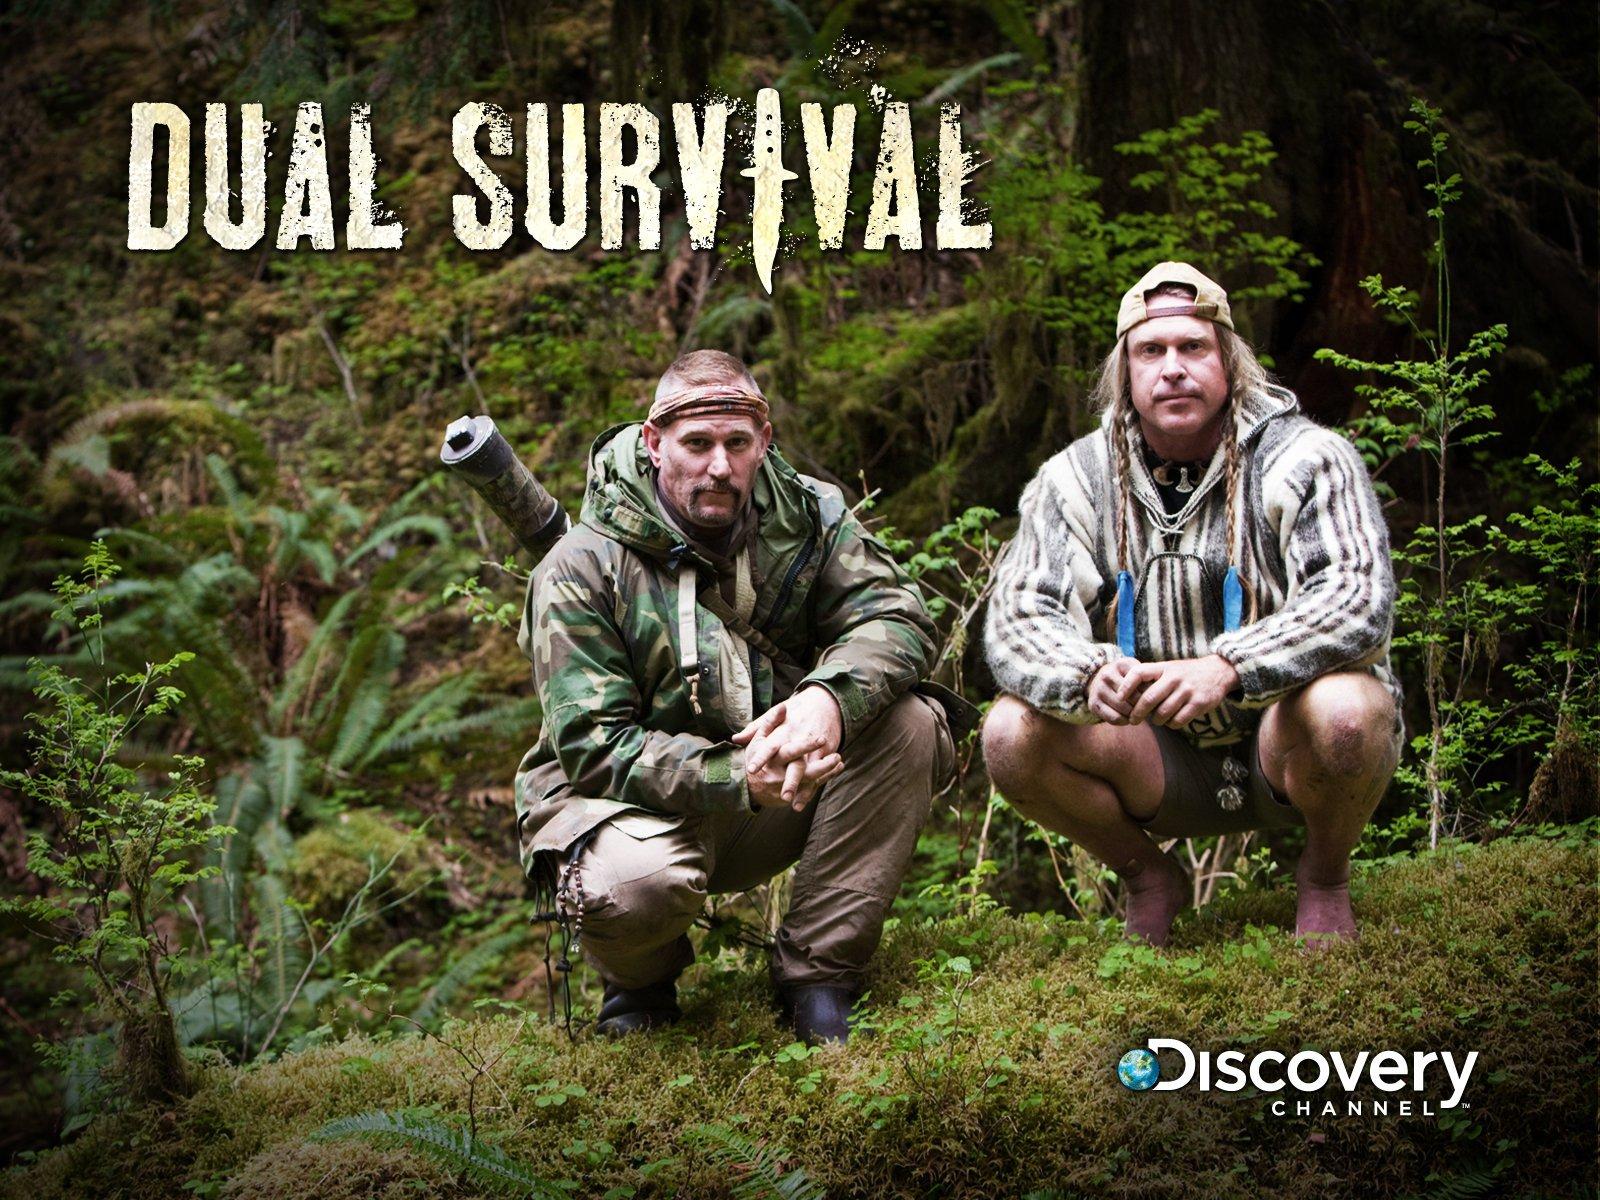 watch dual survival season 3 free online